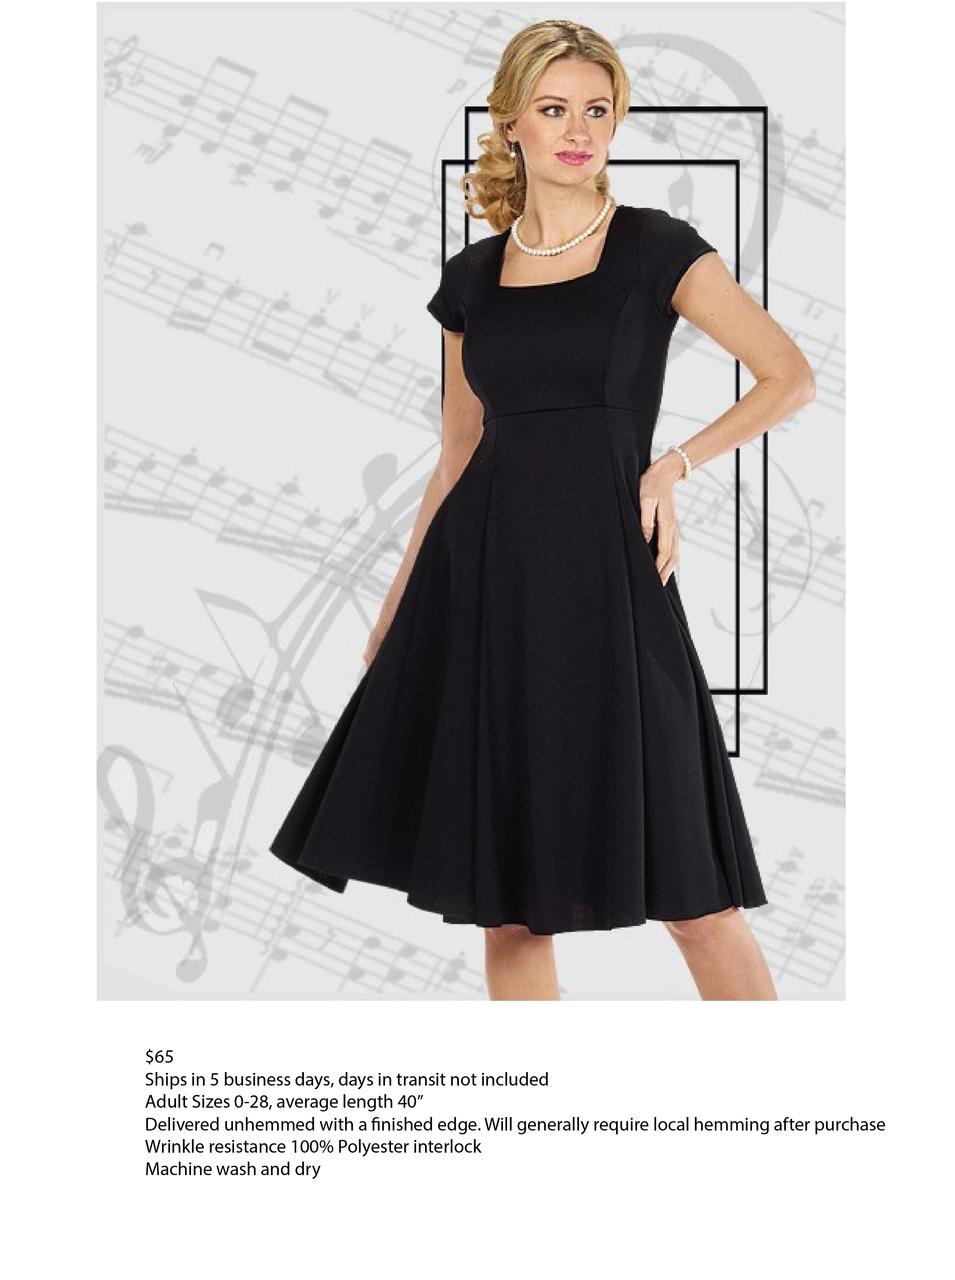 TW Lianna Dress